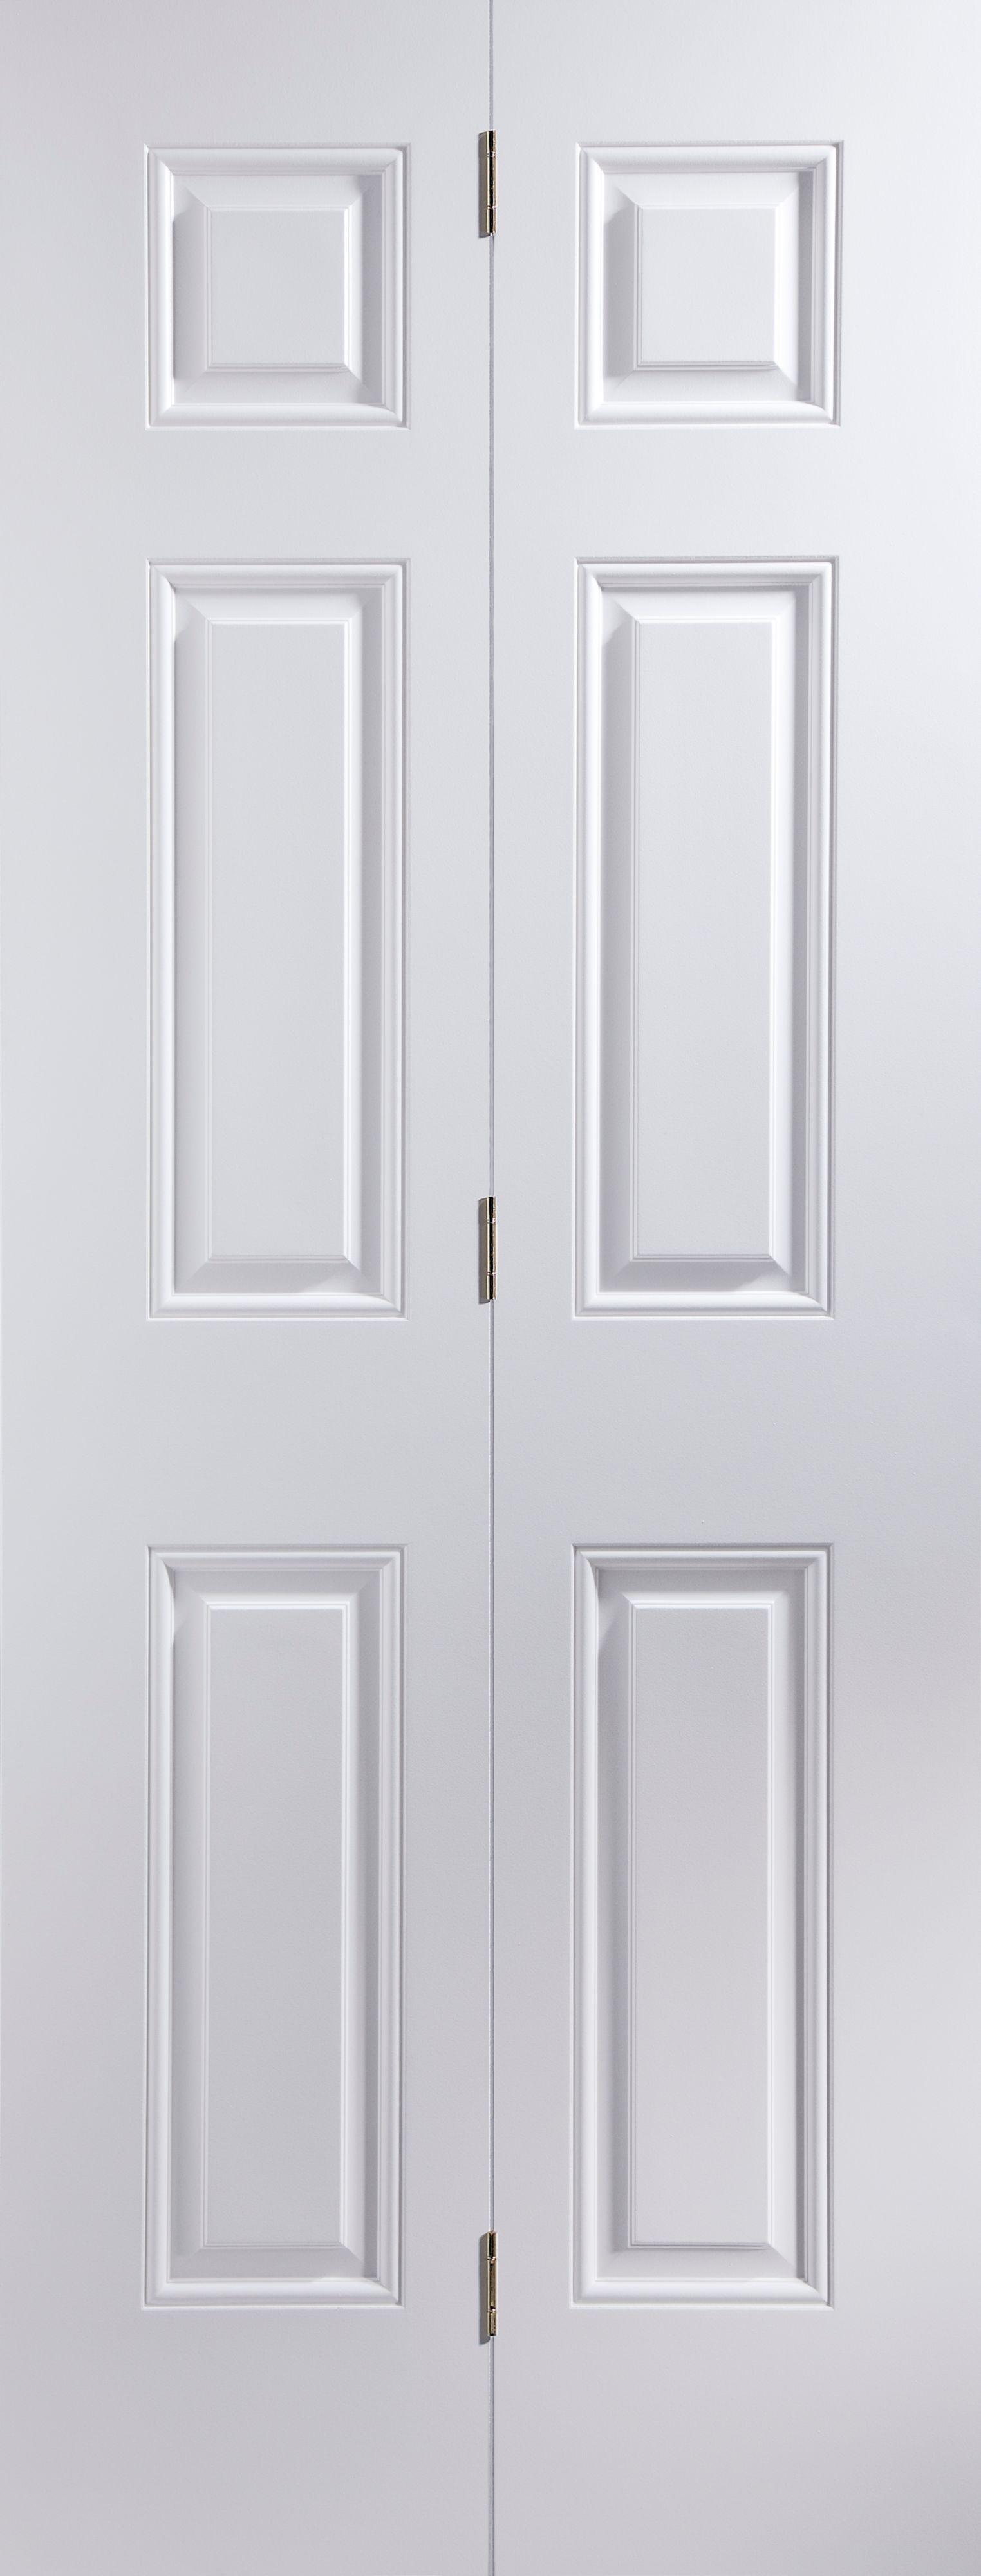 6 Panel Primed Smooth Glazed Internal Bi-fold Door, (h)1950mm (w)595mm